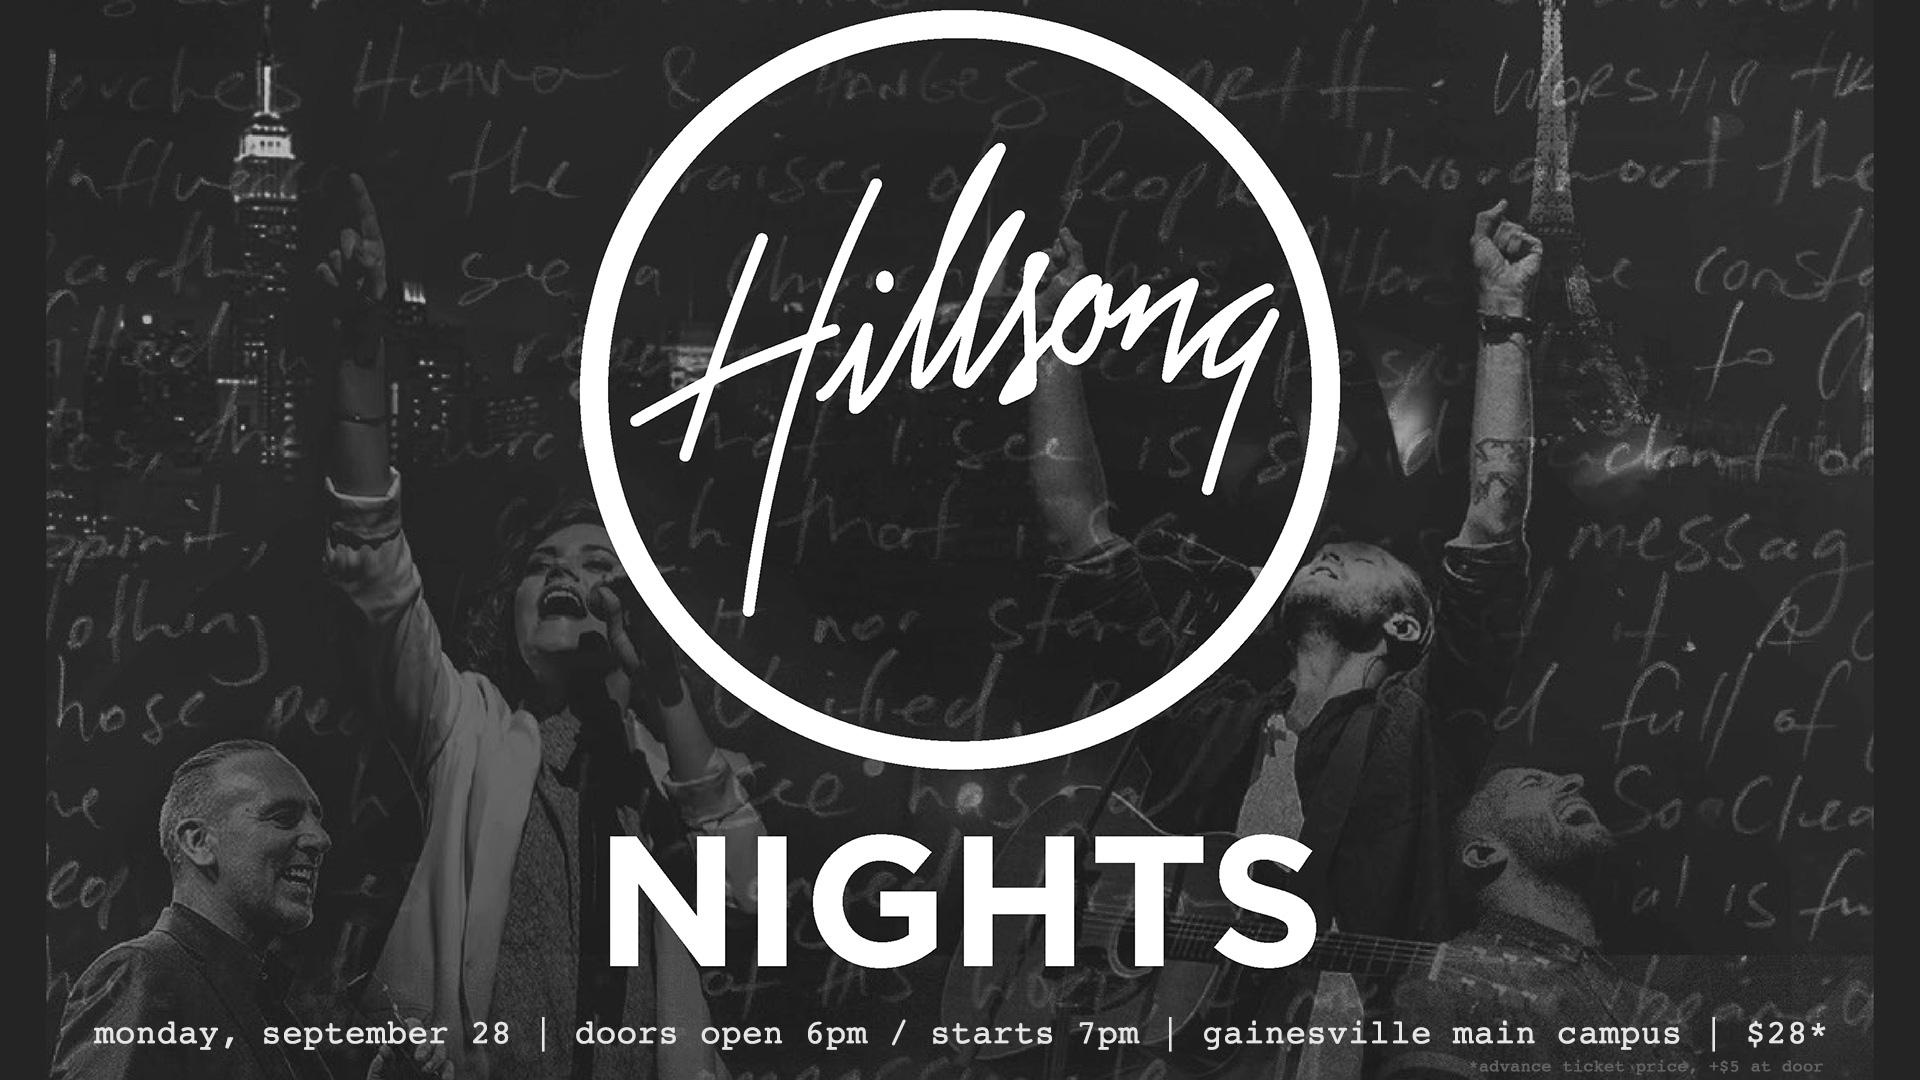 hillsong_nights_slide